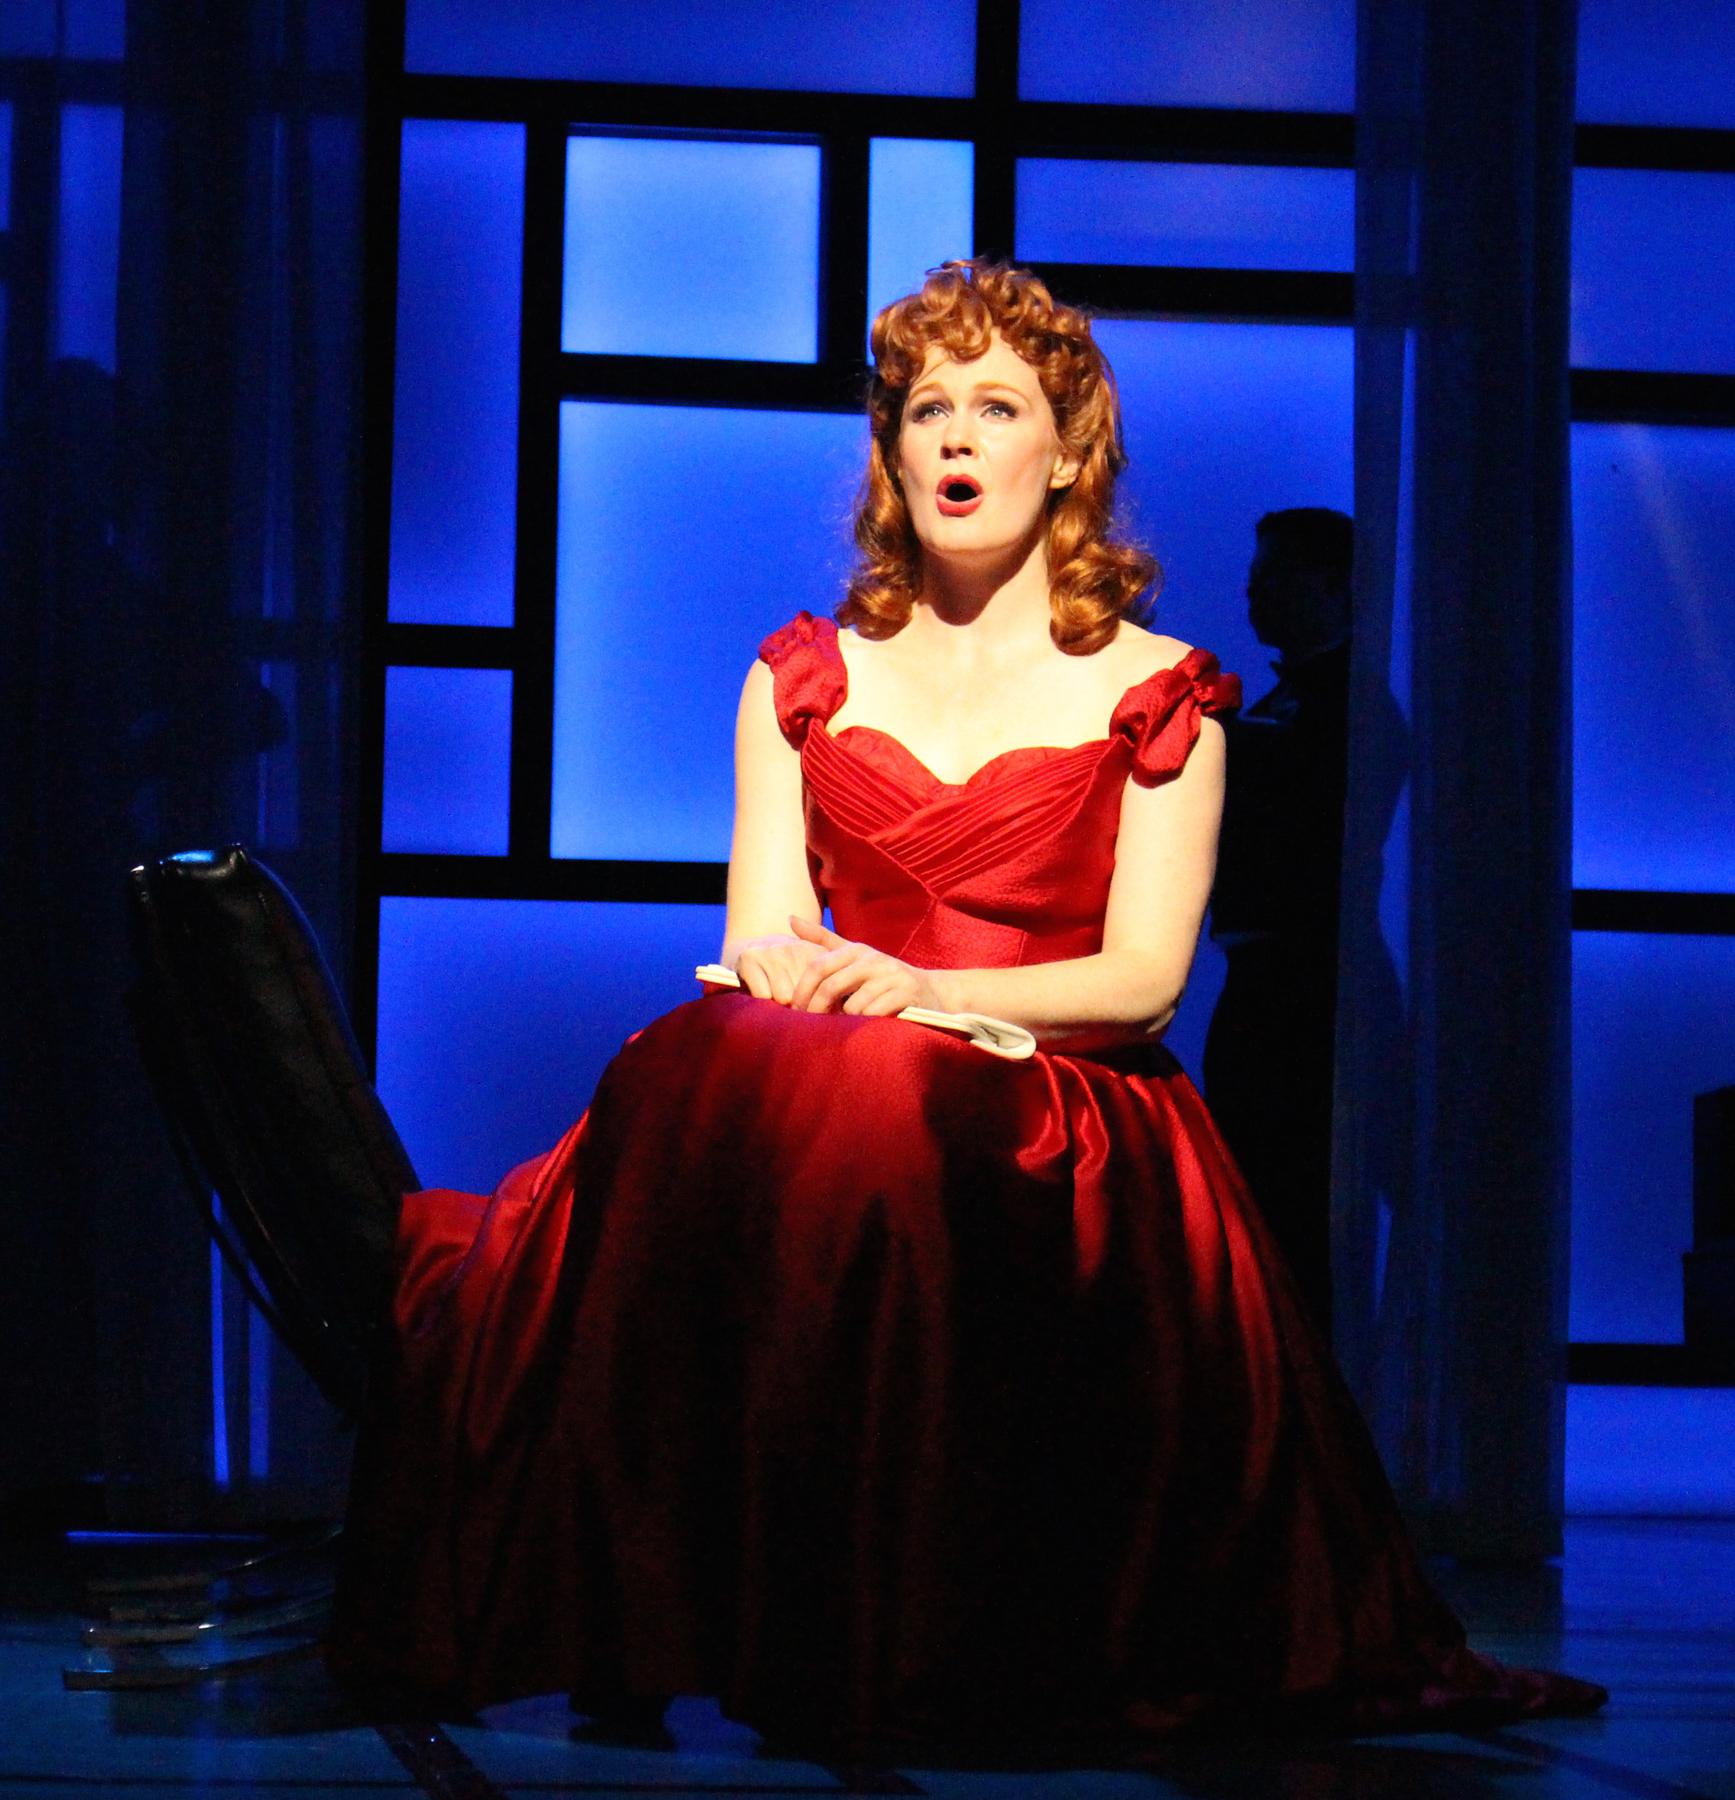 red dress seated.JPG